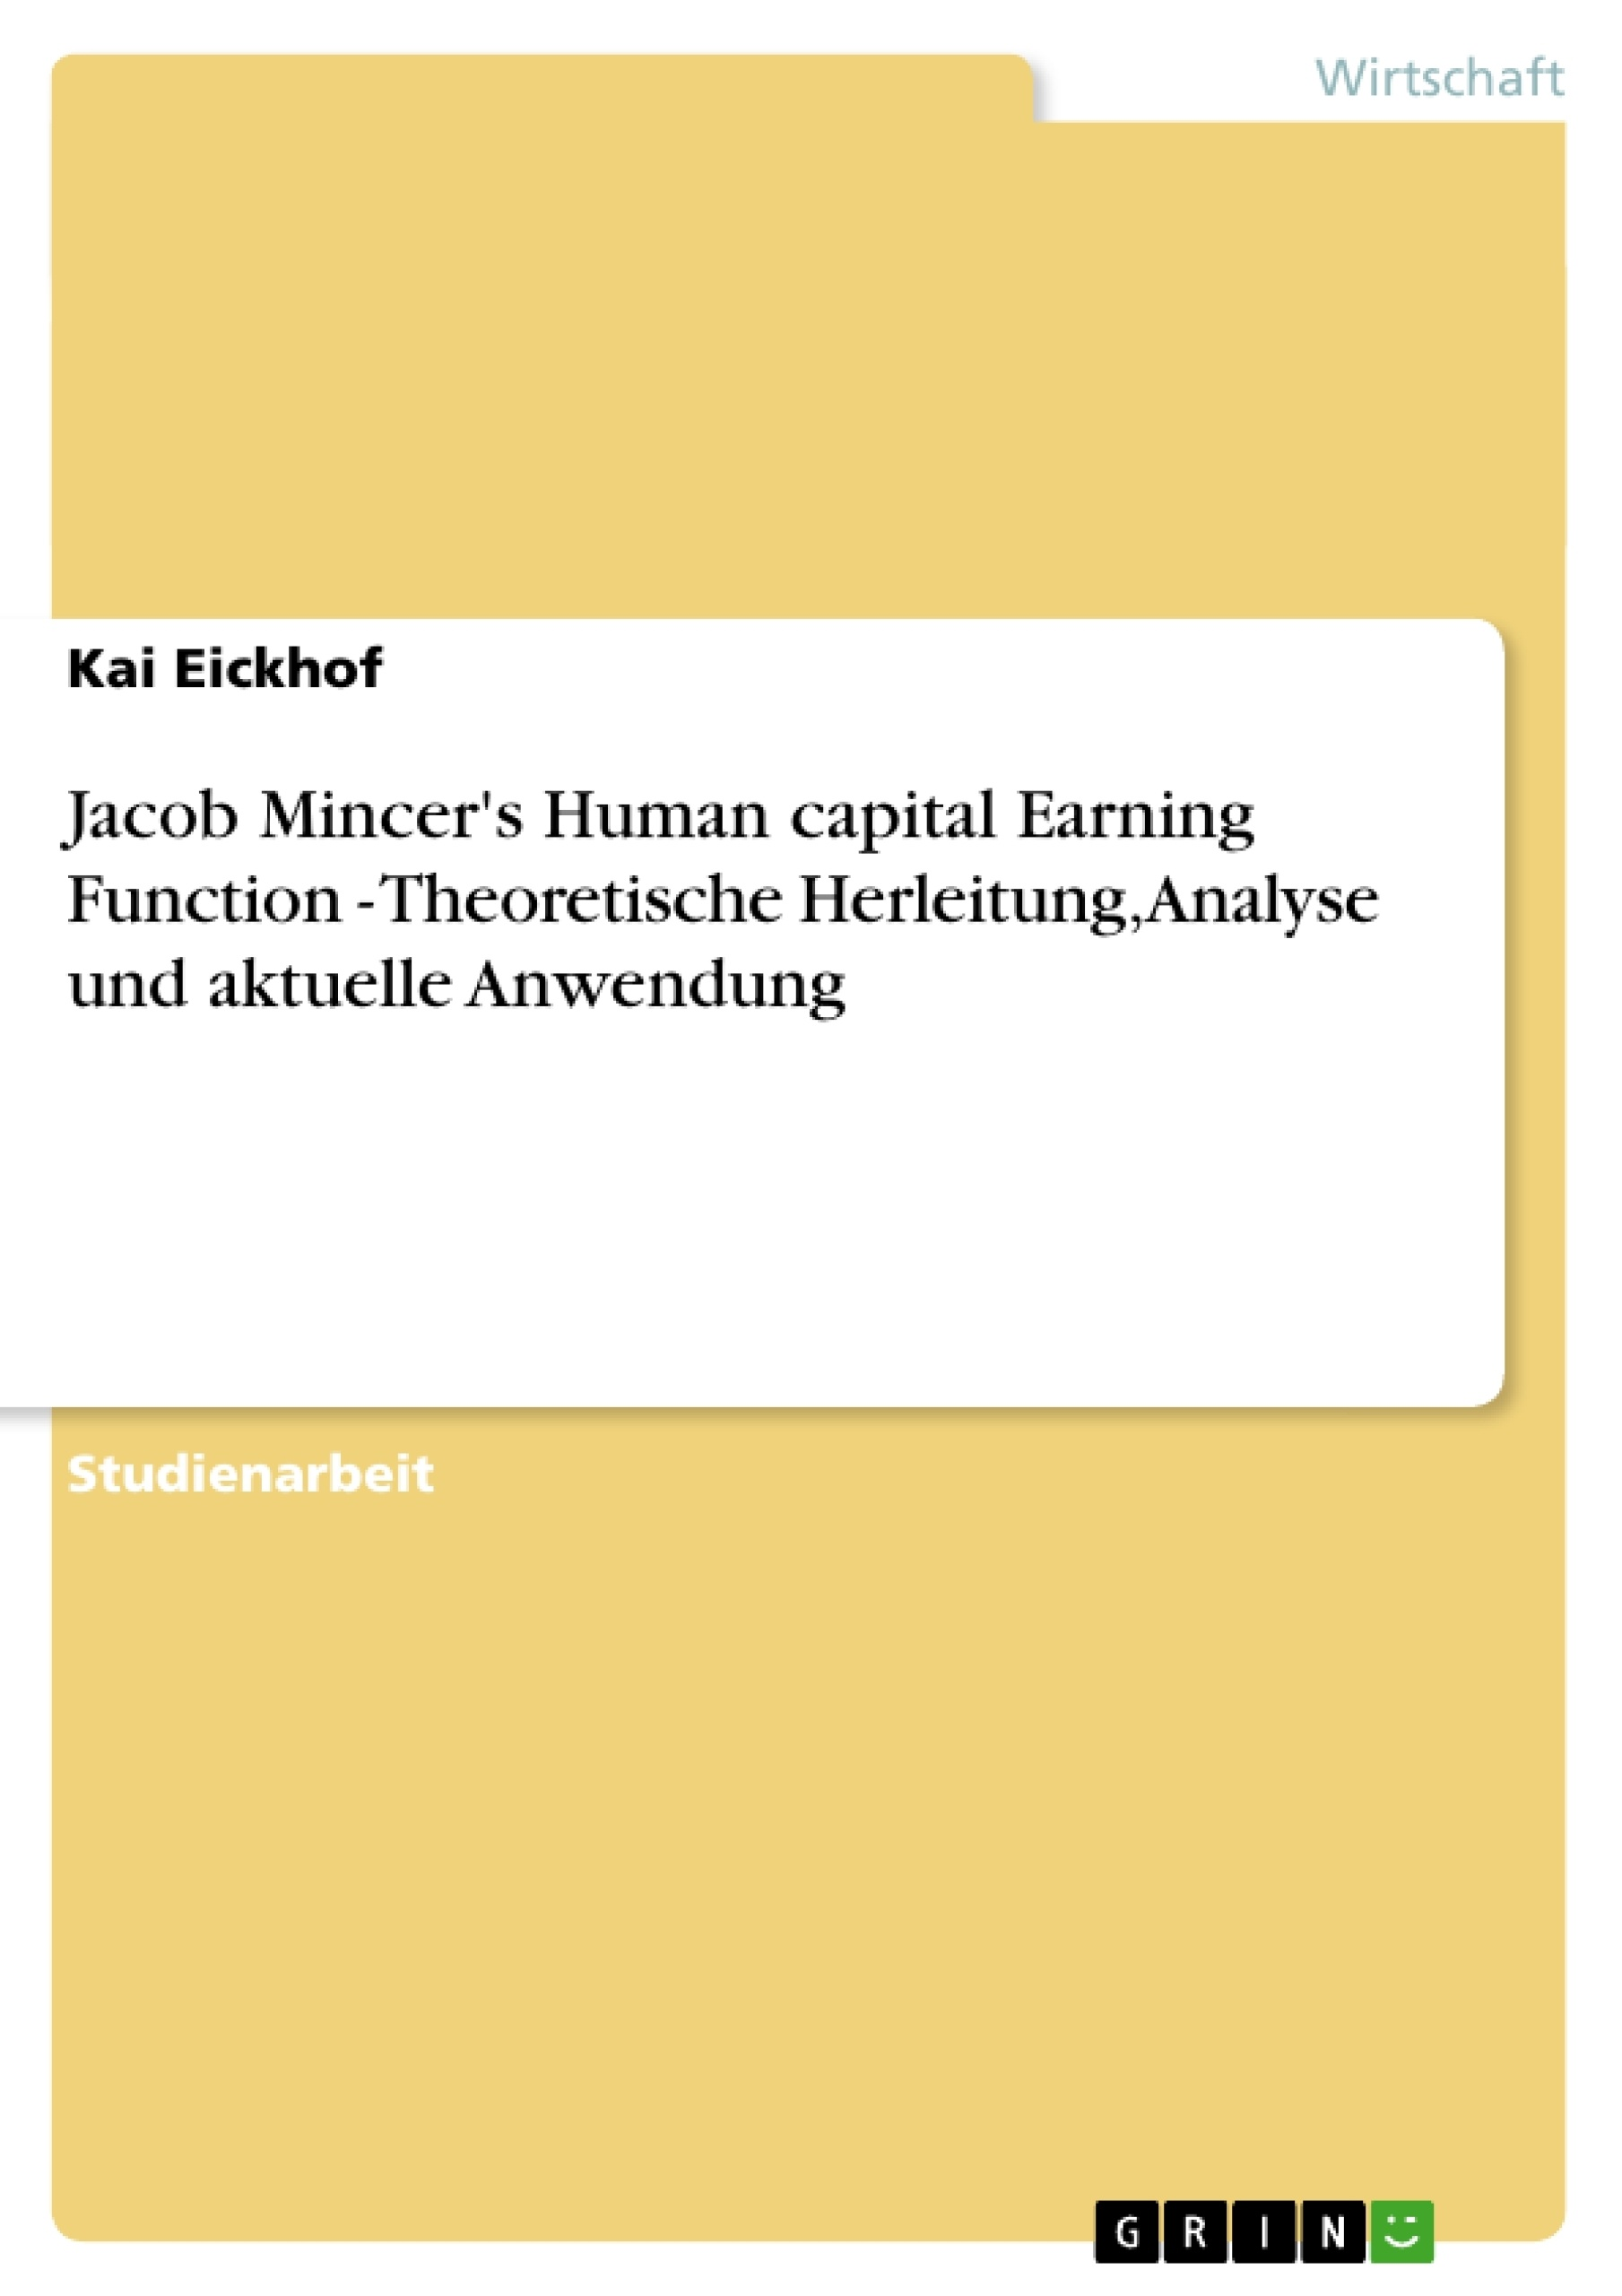 Titel: Jacob Mincer's Human capital Earning Function - Theoretische Herleitung, Analyse und aktuelle Anwendung